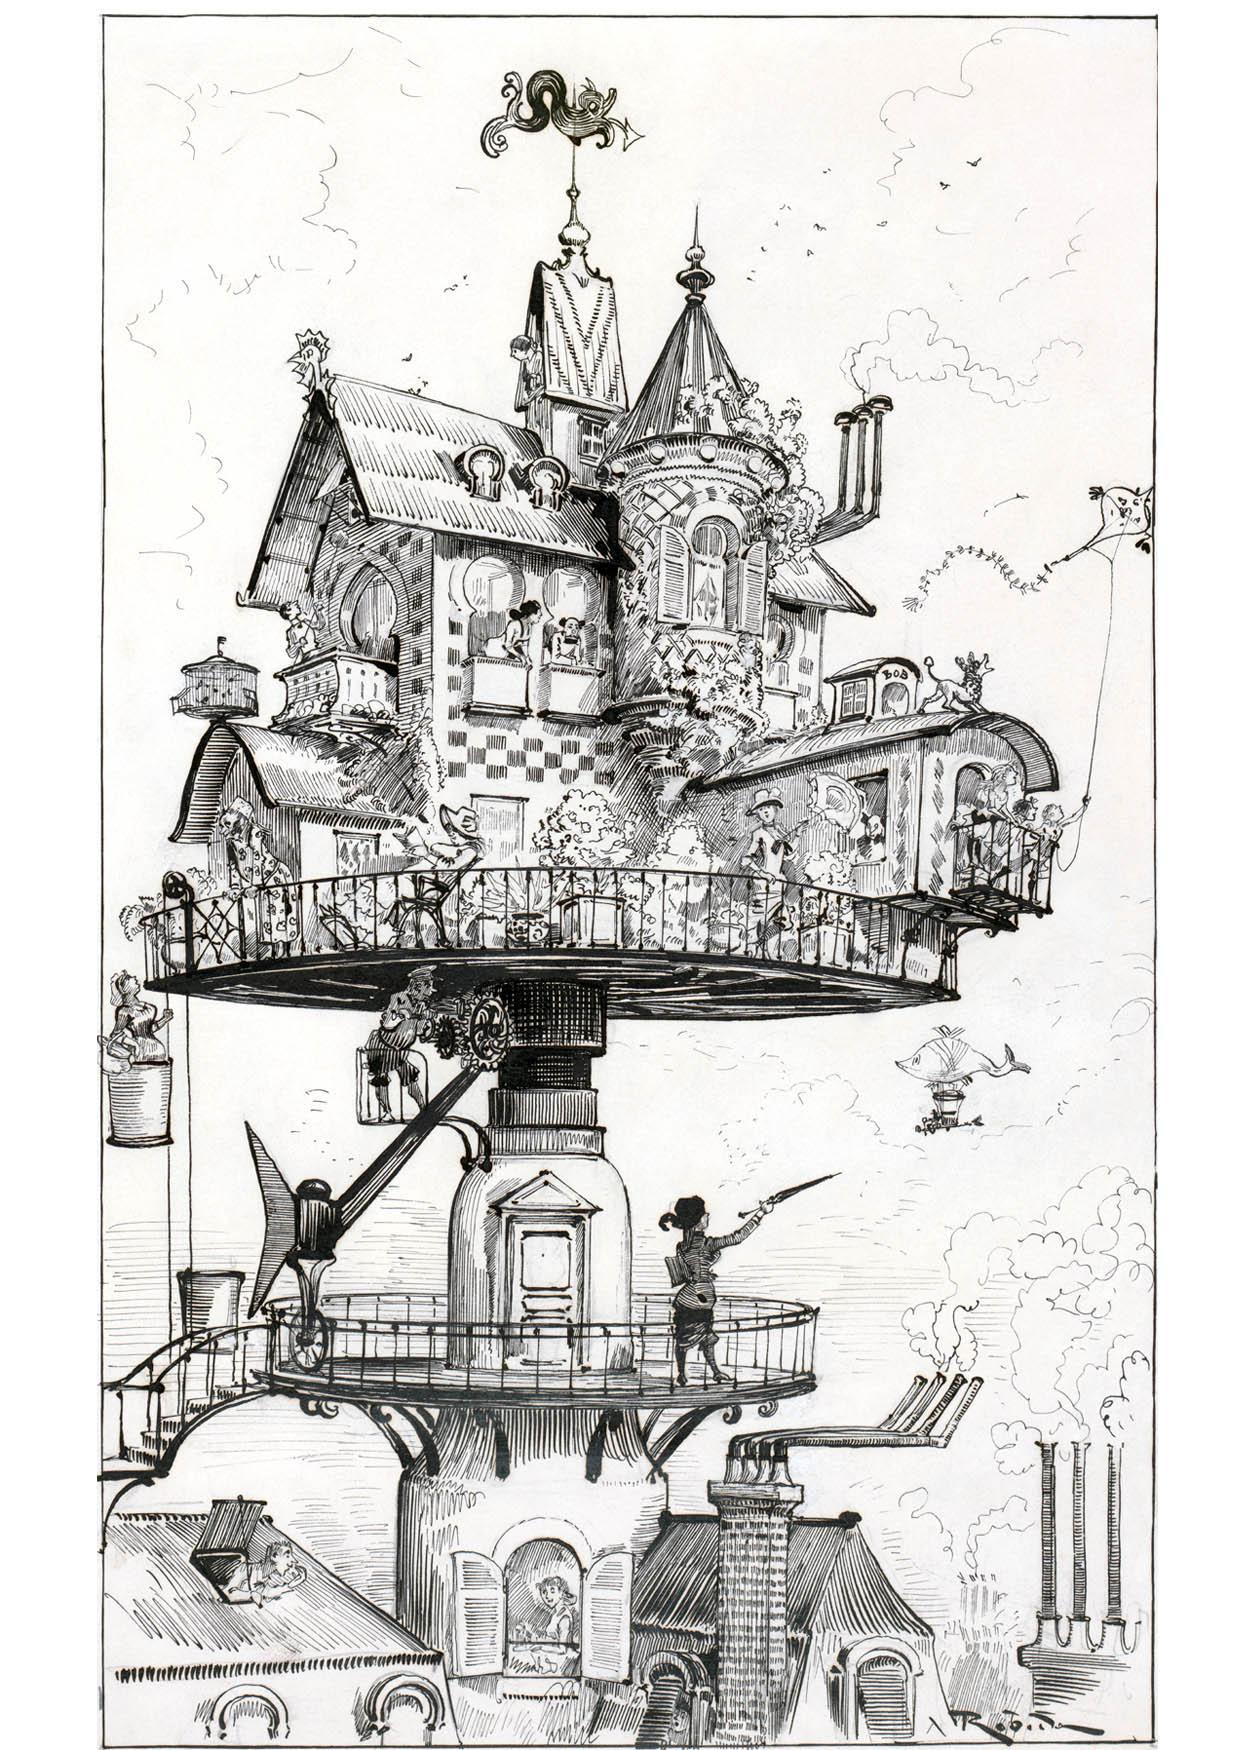 Kleurplaat Huis Van De Toekomst 1883 Afb 14777